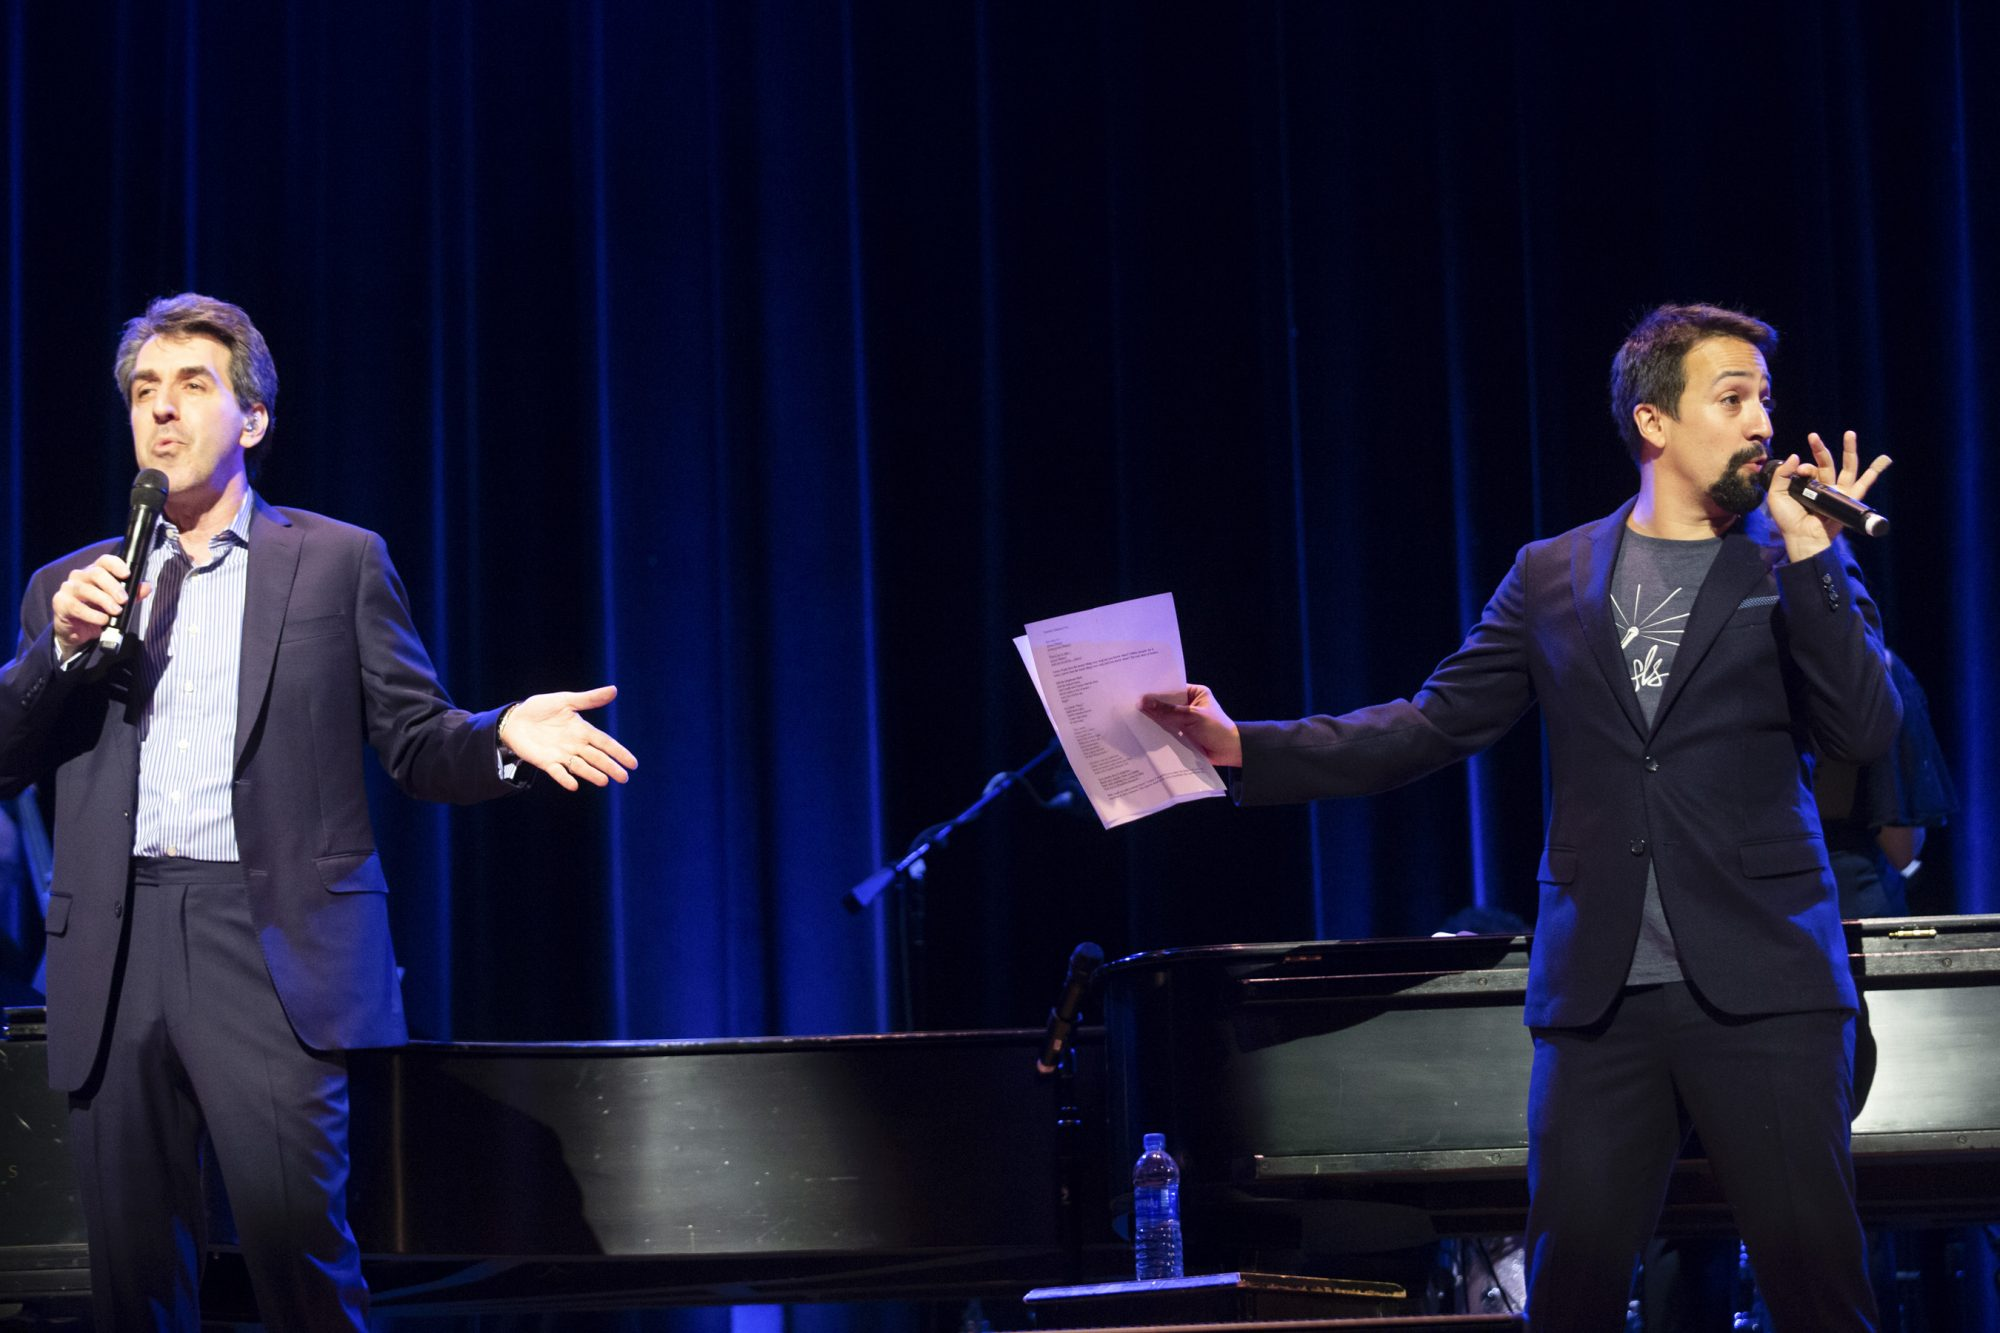 Jason Robert Brown and Stephen Sondheim performance